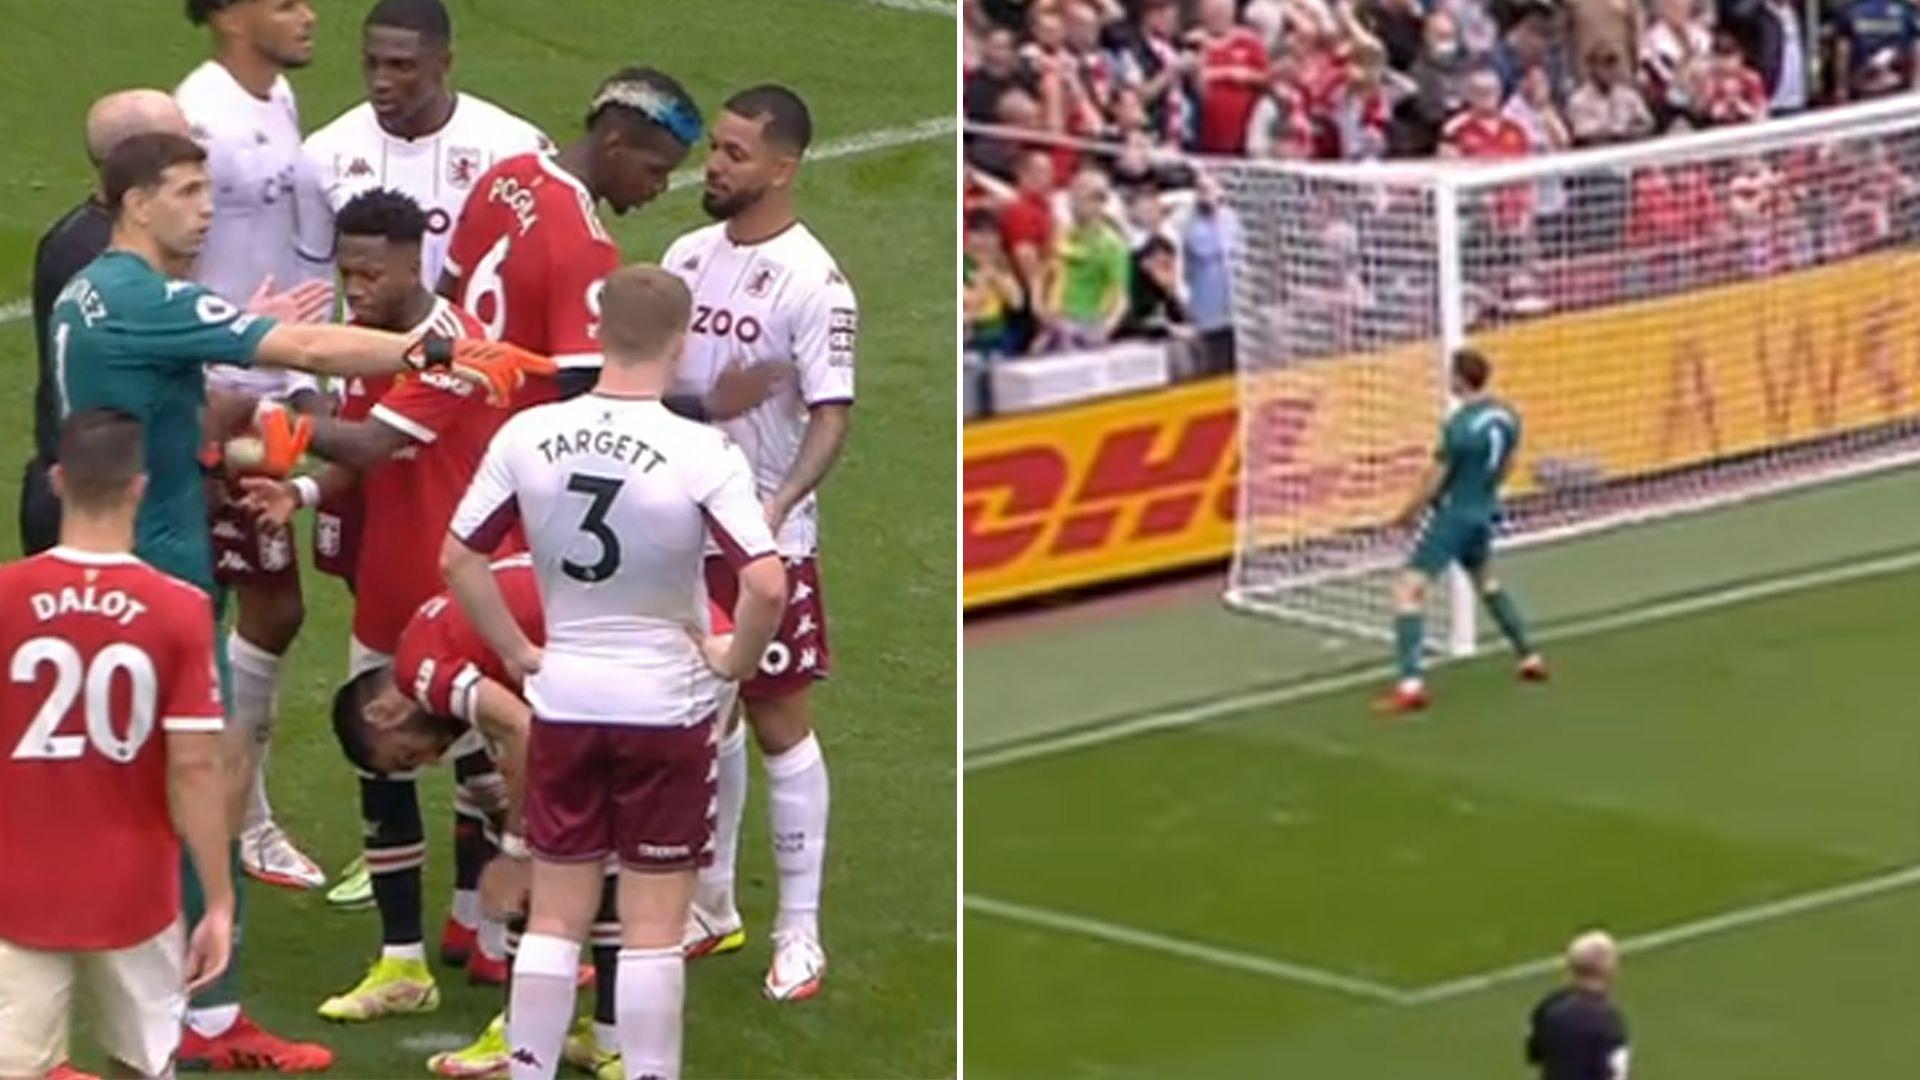 El show de Dibu Martínez en la Premier: desafió a Cristiano Ronaldo a patear un penal, Manchester United falló y celebró con baile ante los fanáticos